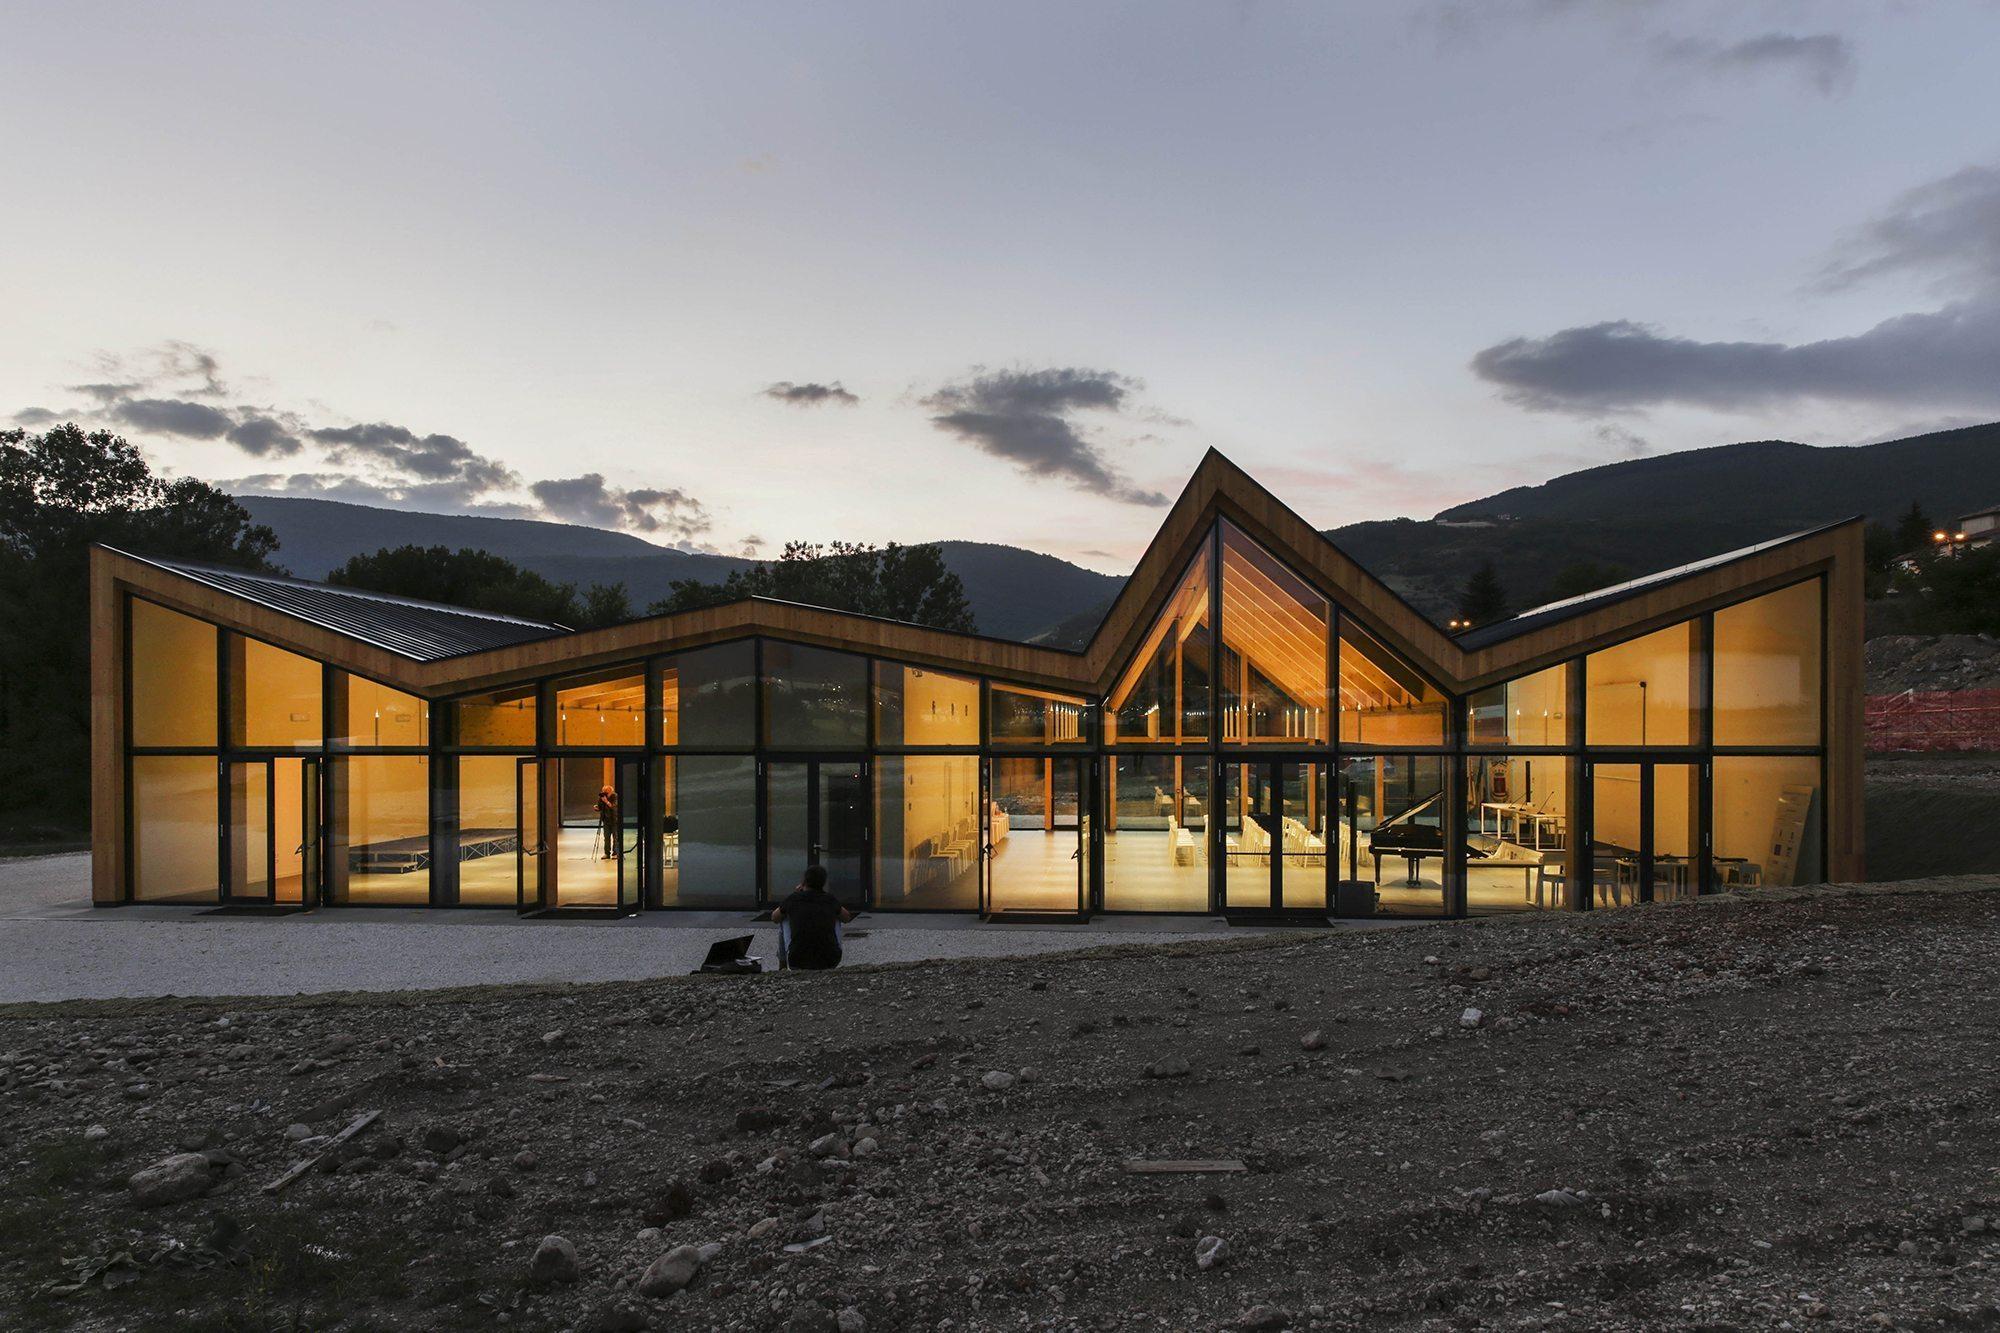 AUDITORIUM DI NORCIA (Italia, 2017) arch. Stefano Boeri